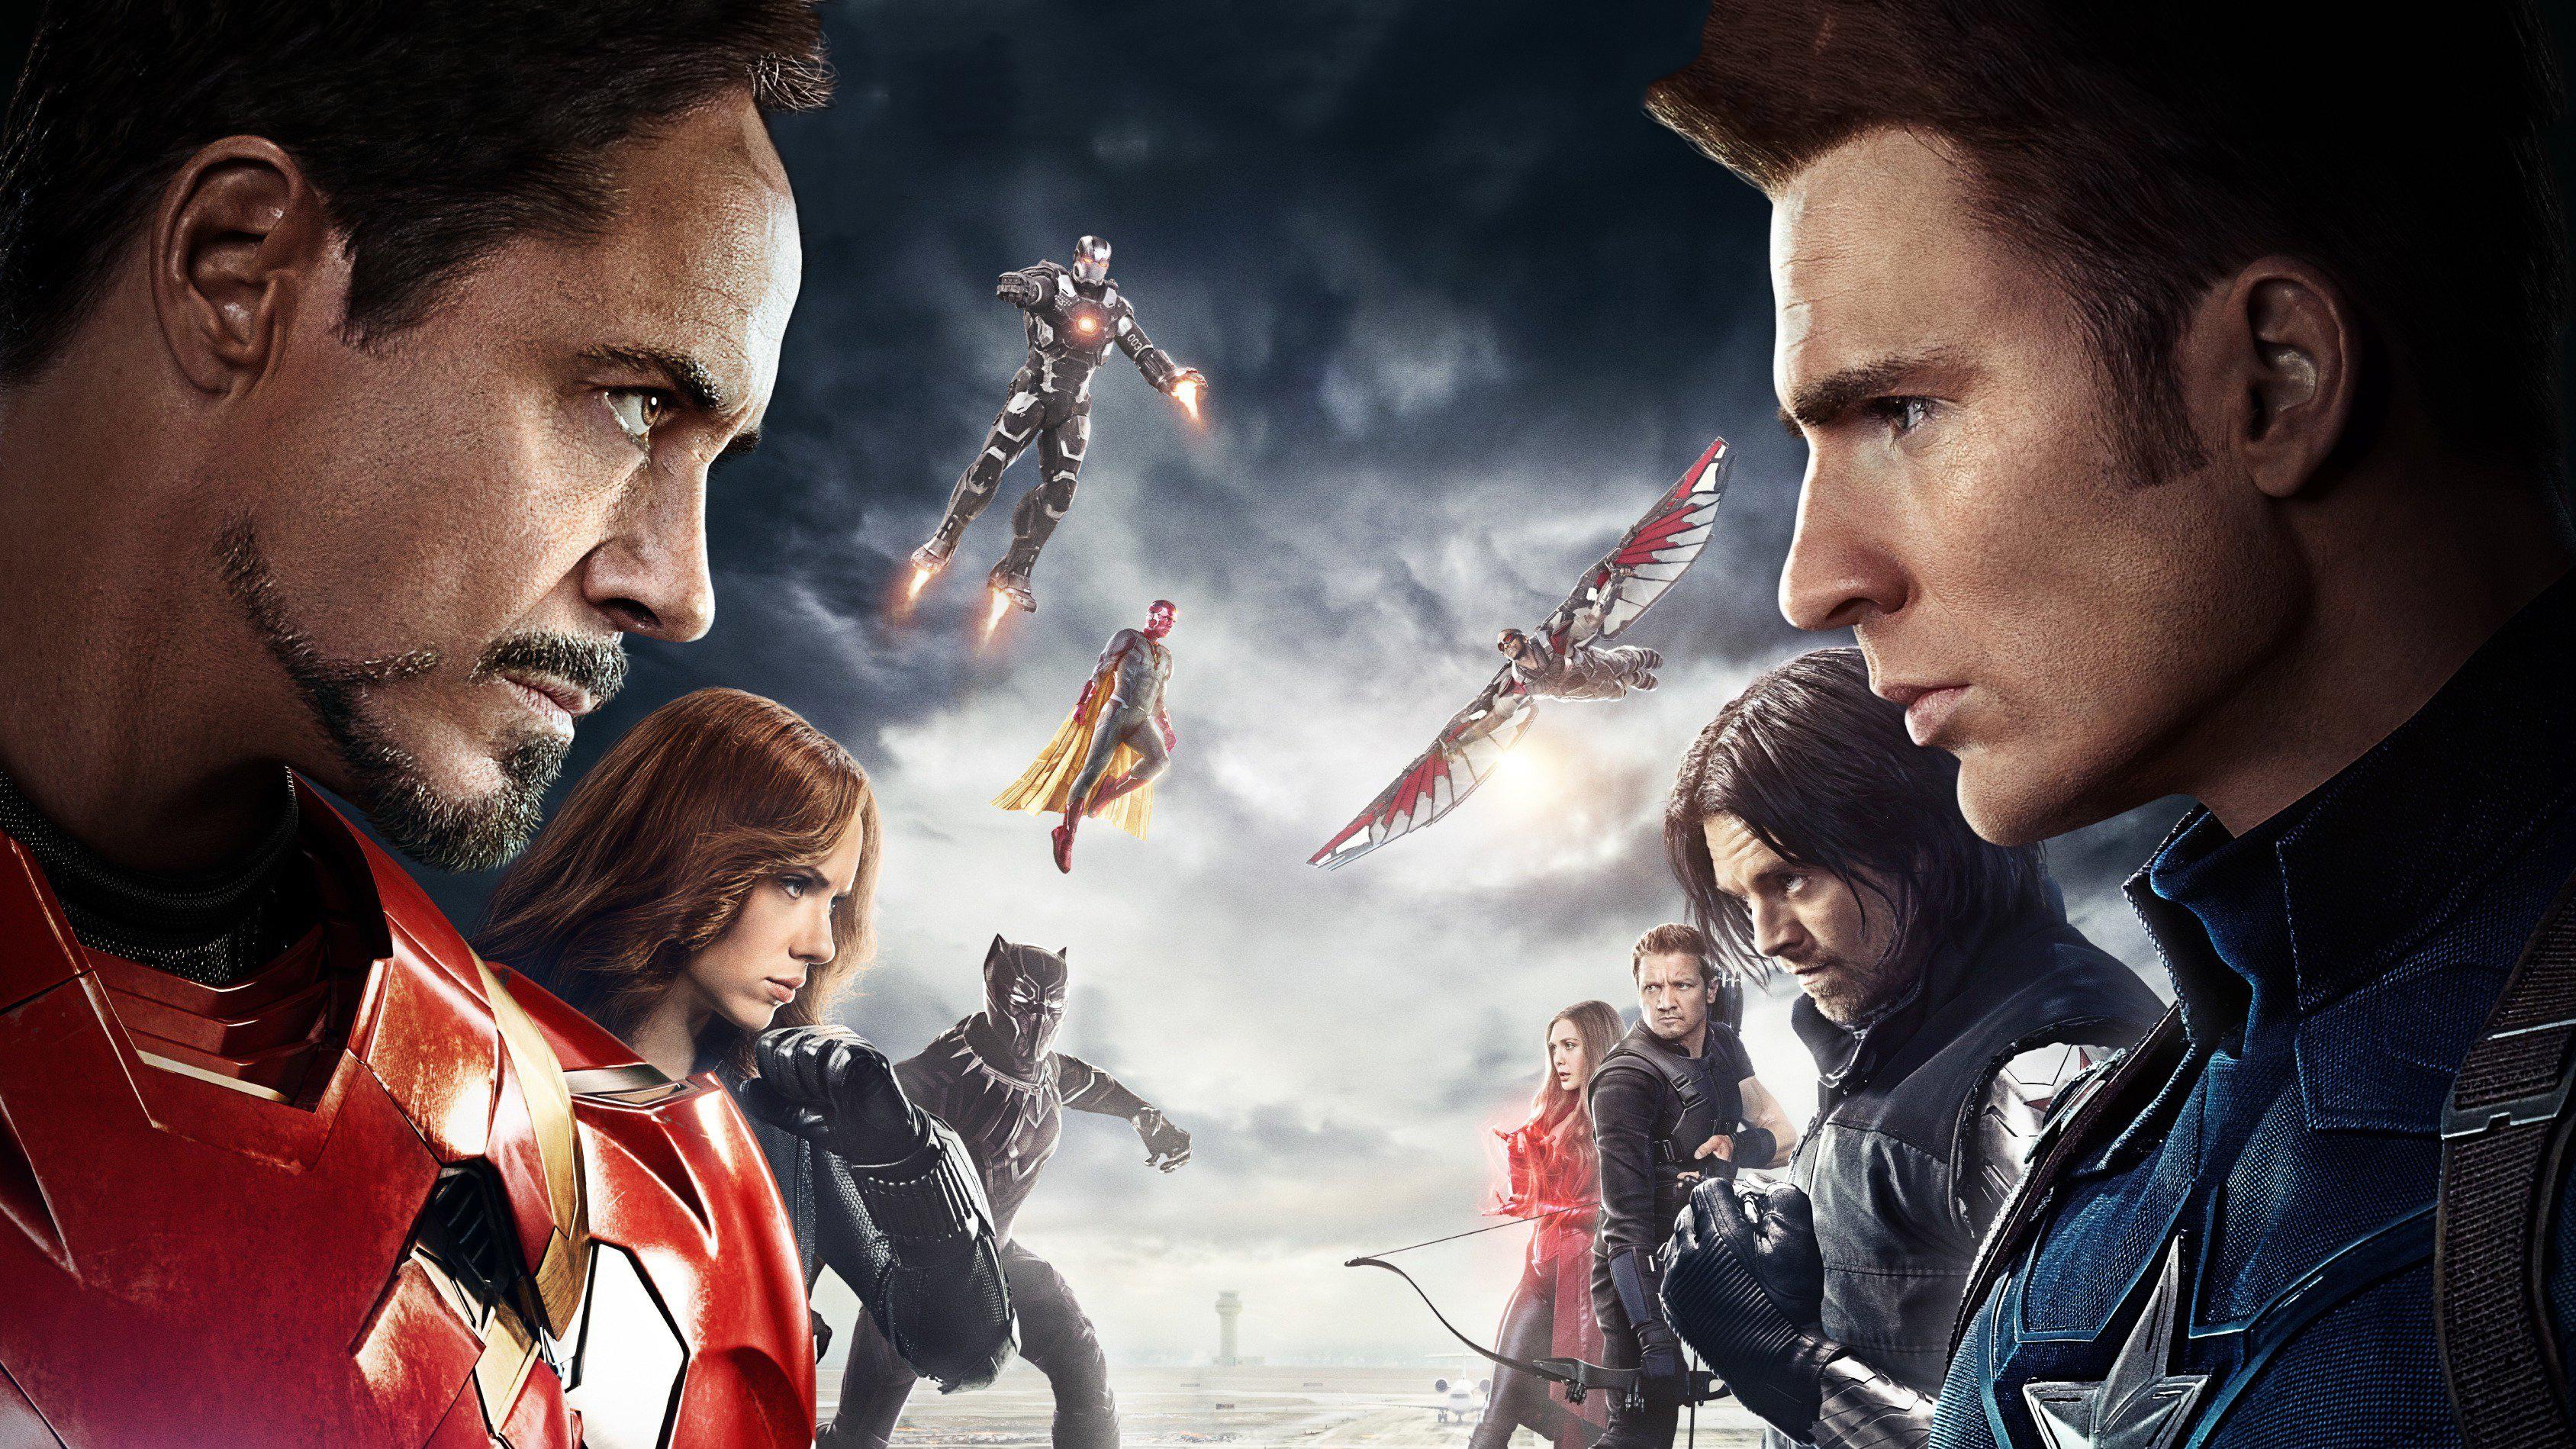 Captain America Civil War Wallpaper 4k: Captain America Civil War Poster, HD Movies, 4k Wallpapers